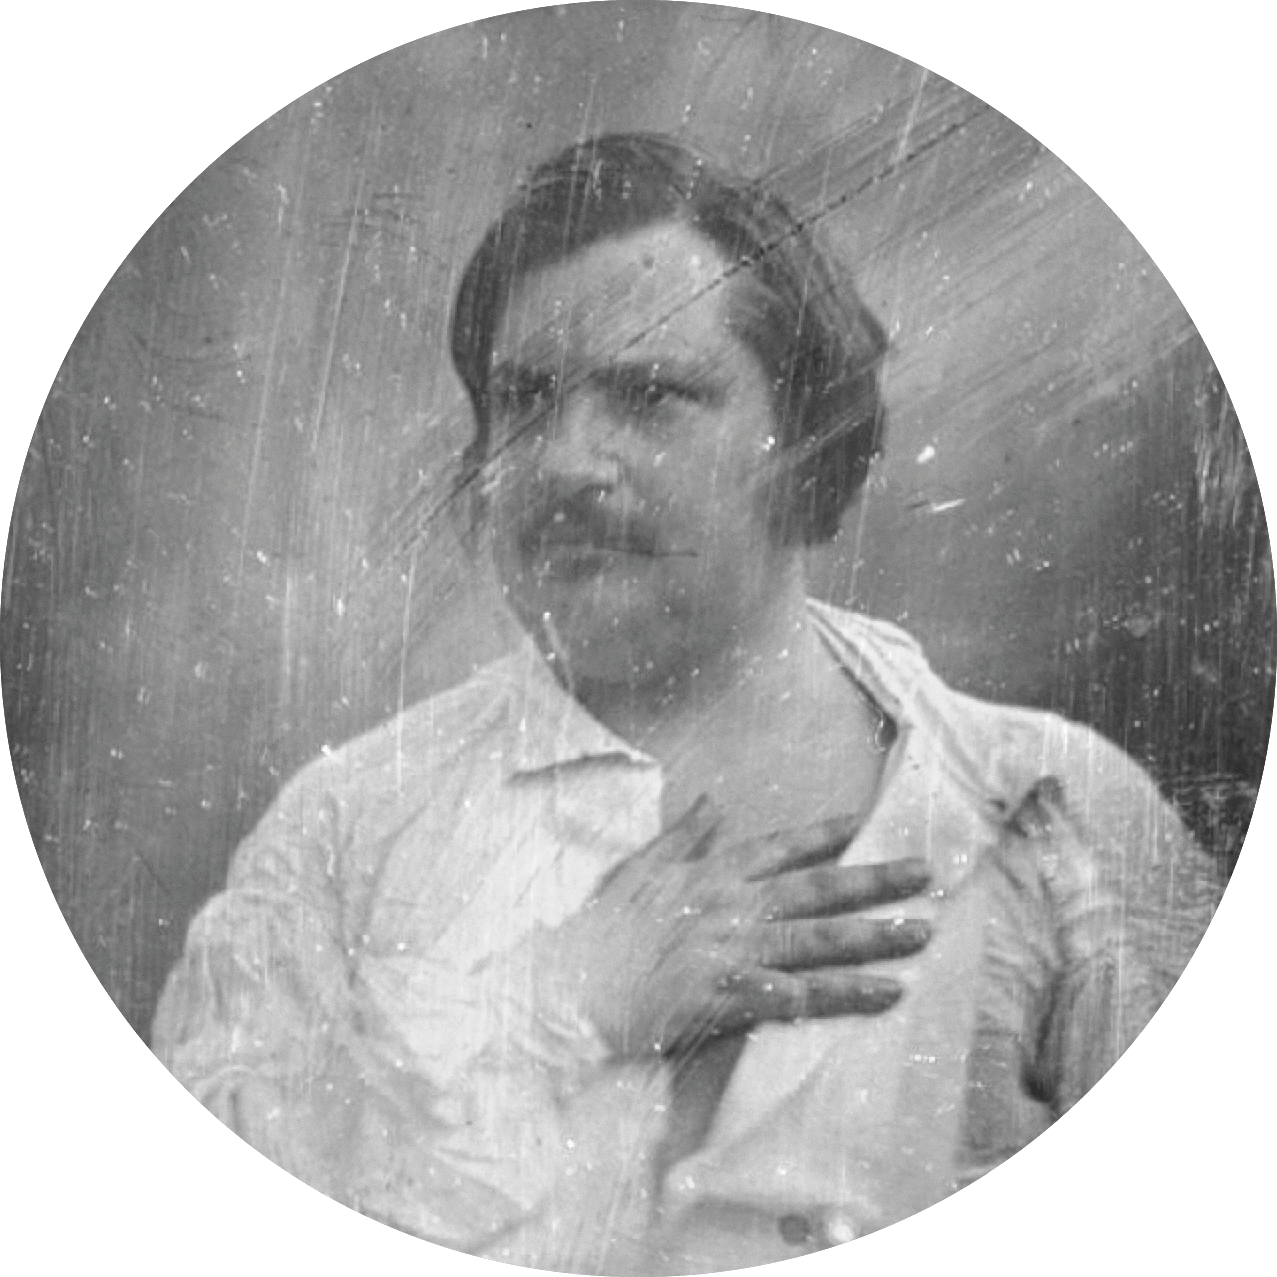 Daguerrotype, Honoré de Balzac.